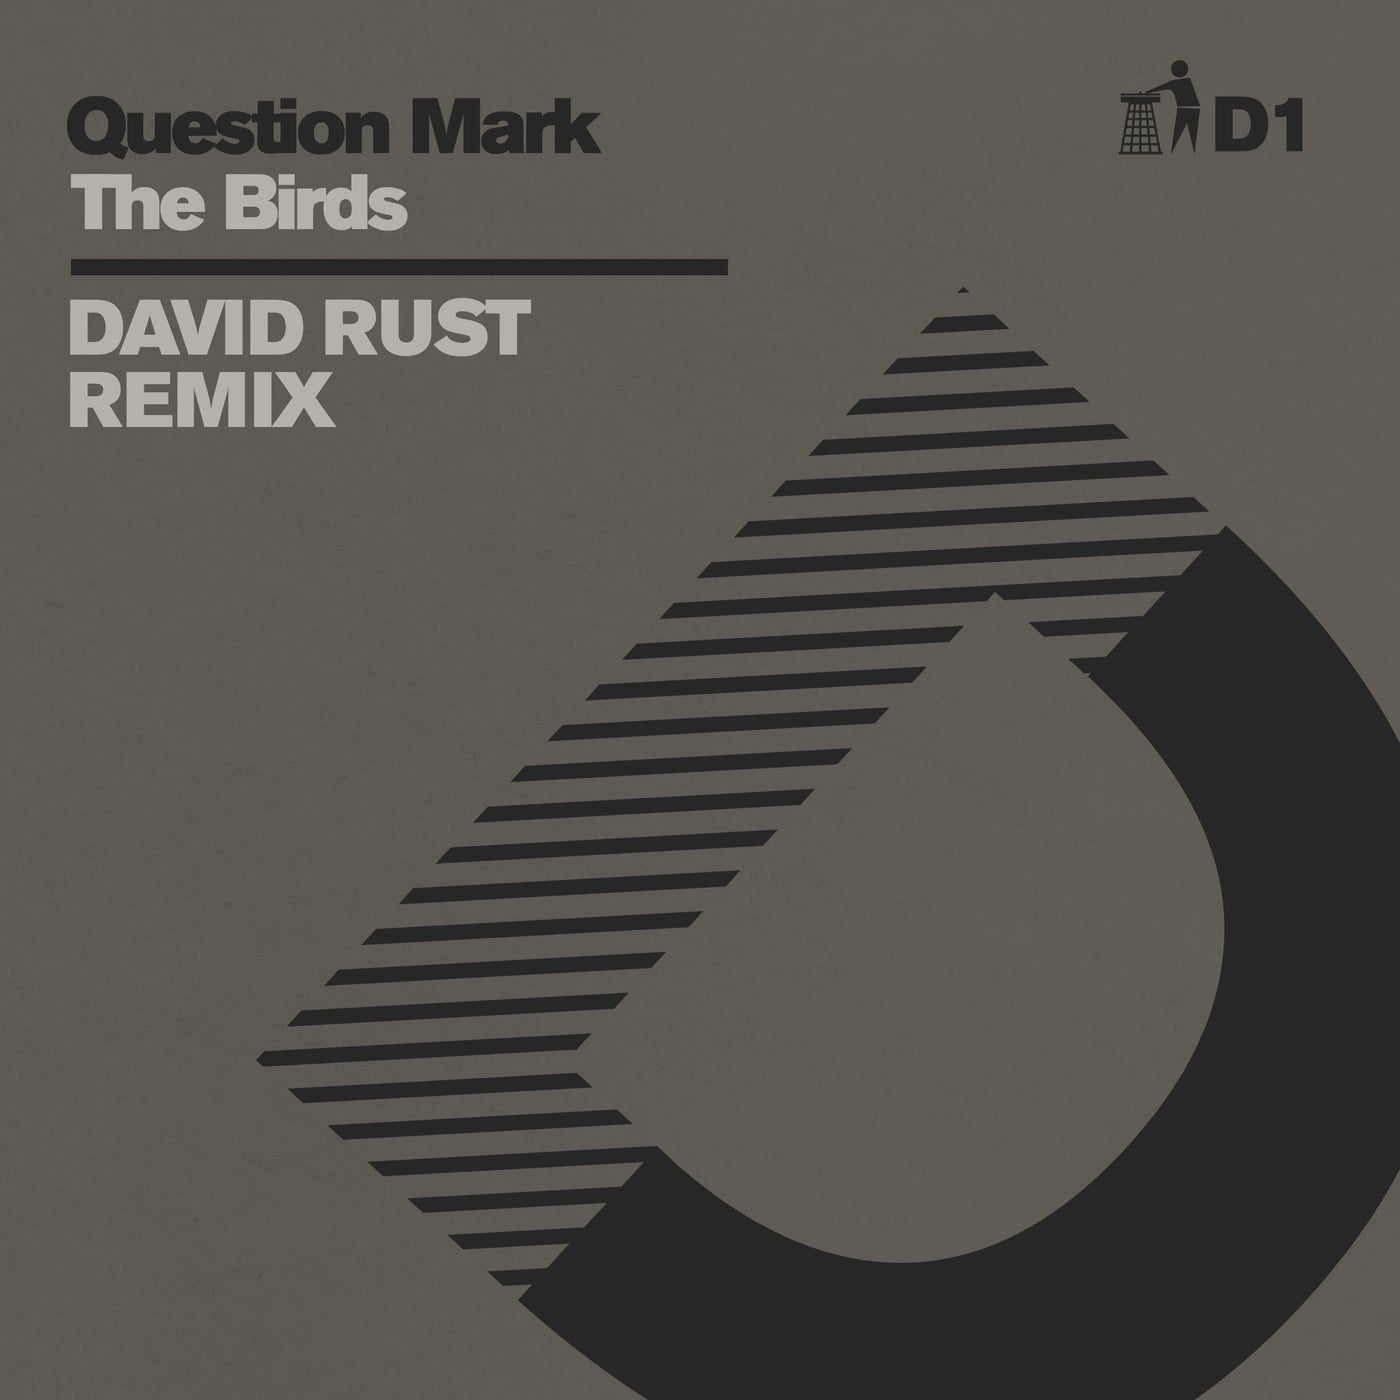 The Birds (David Rust Remix - D1)